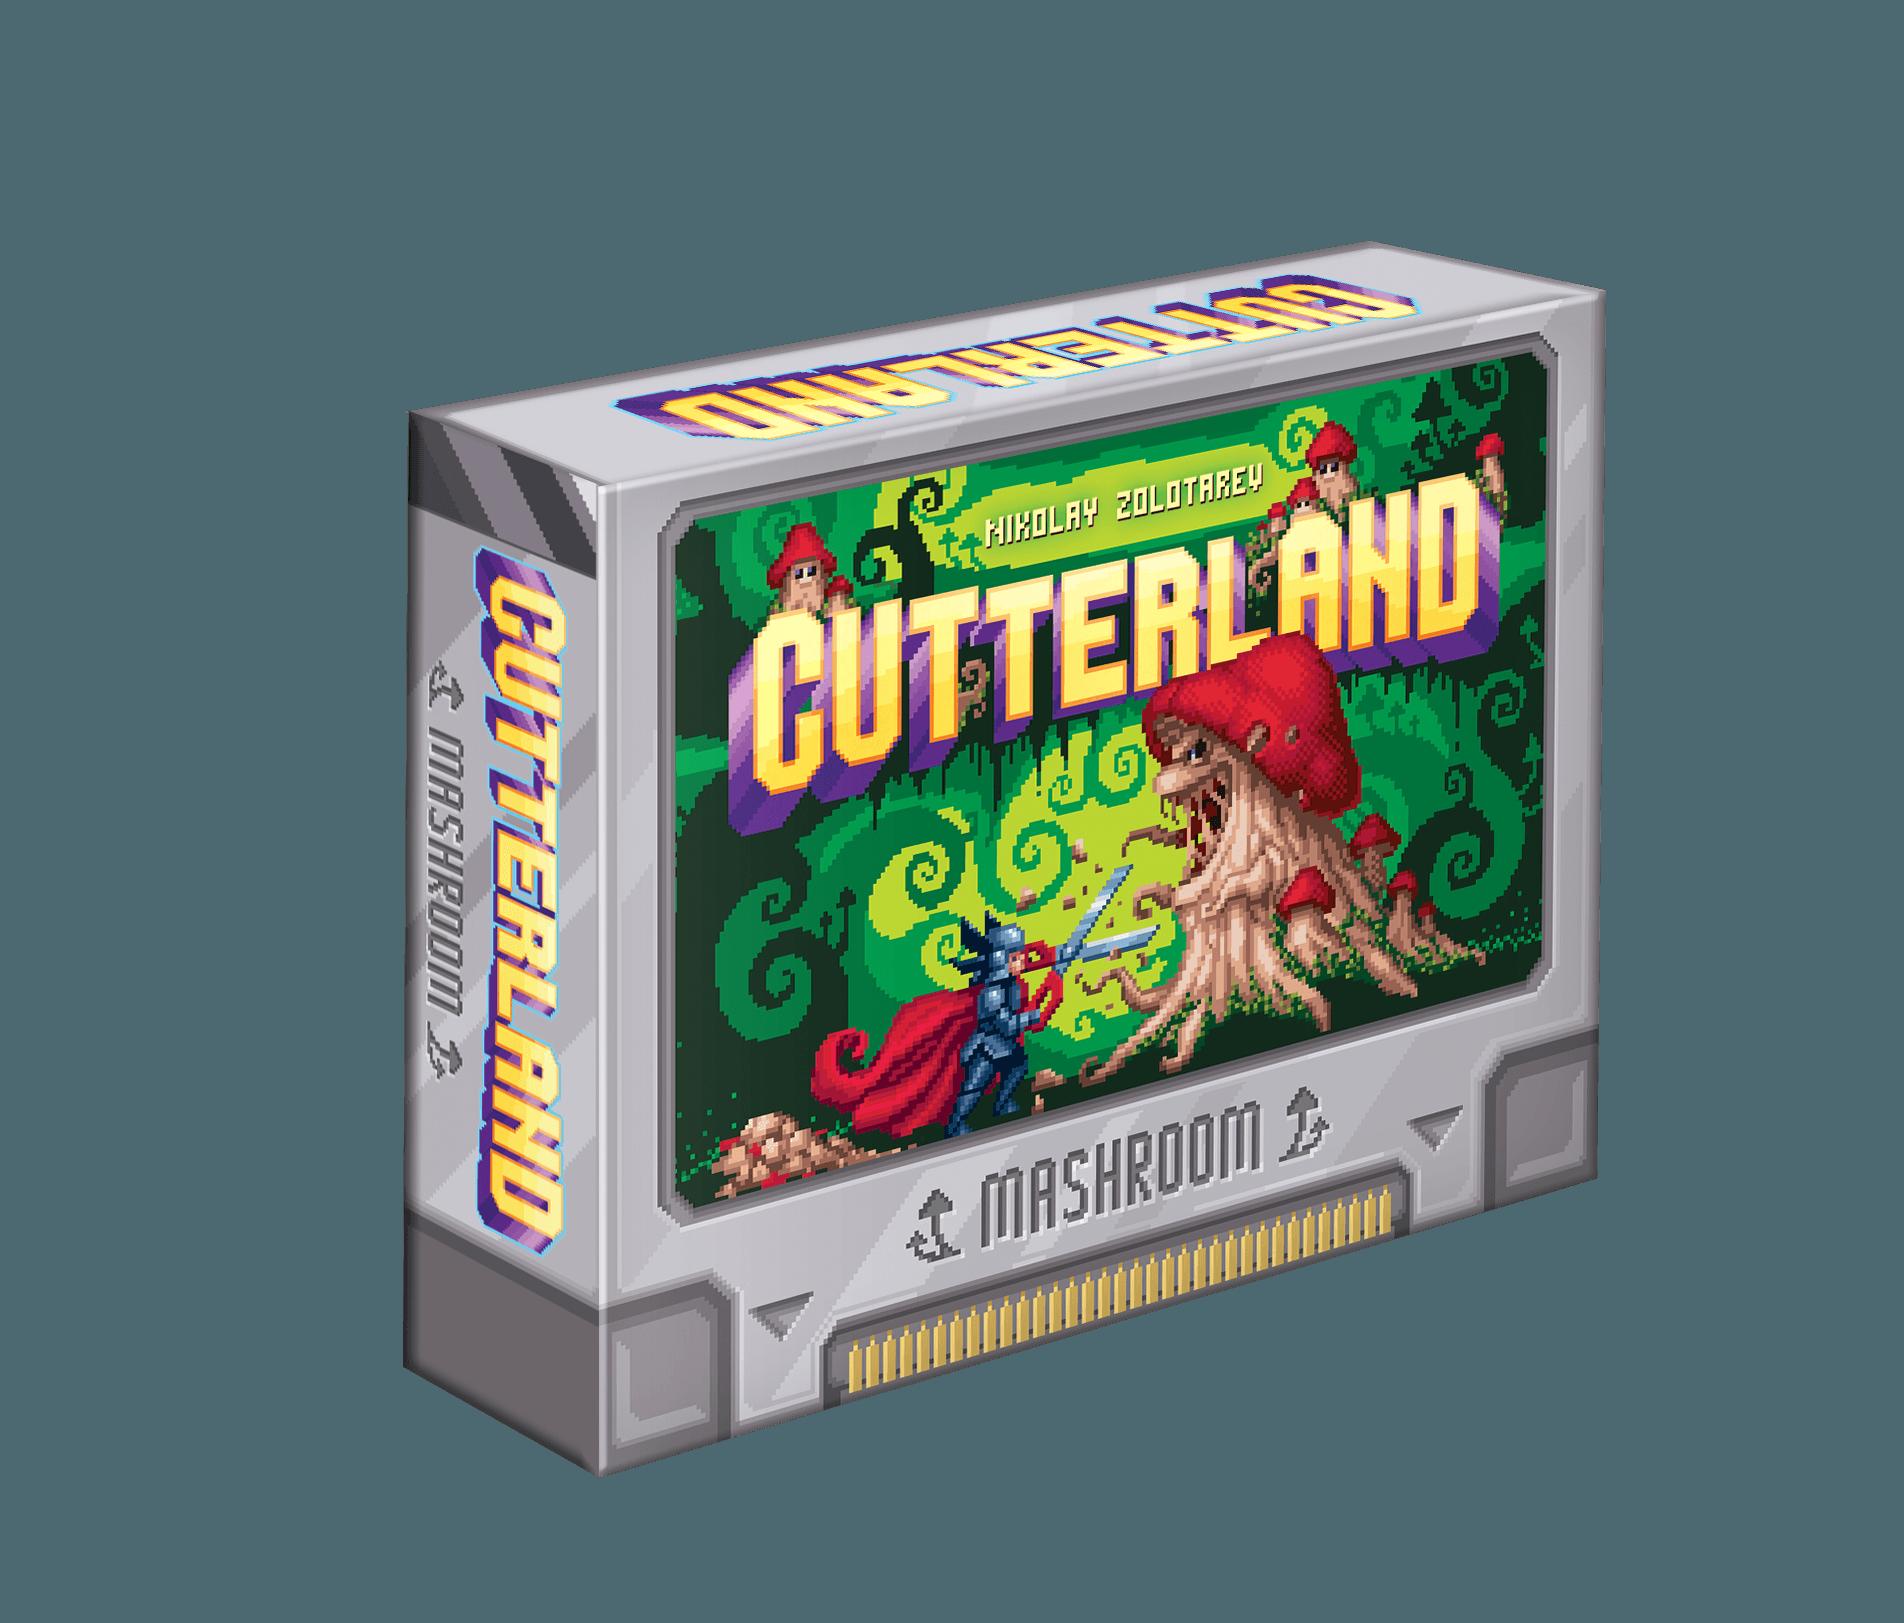 Cutterland: Cartridge Pack – Mashroom